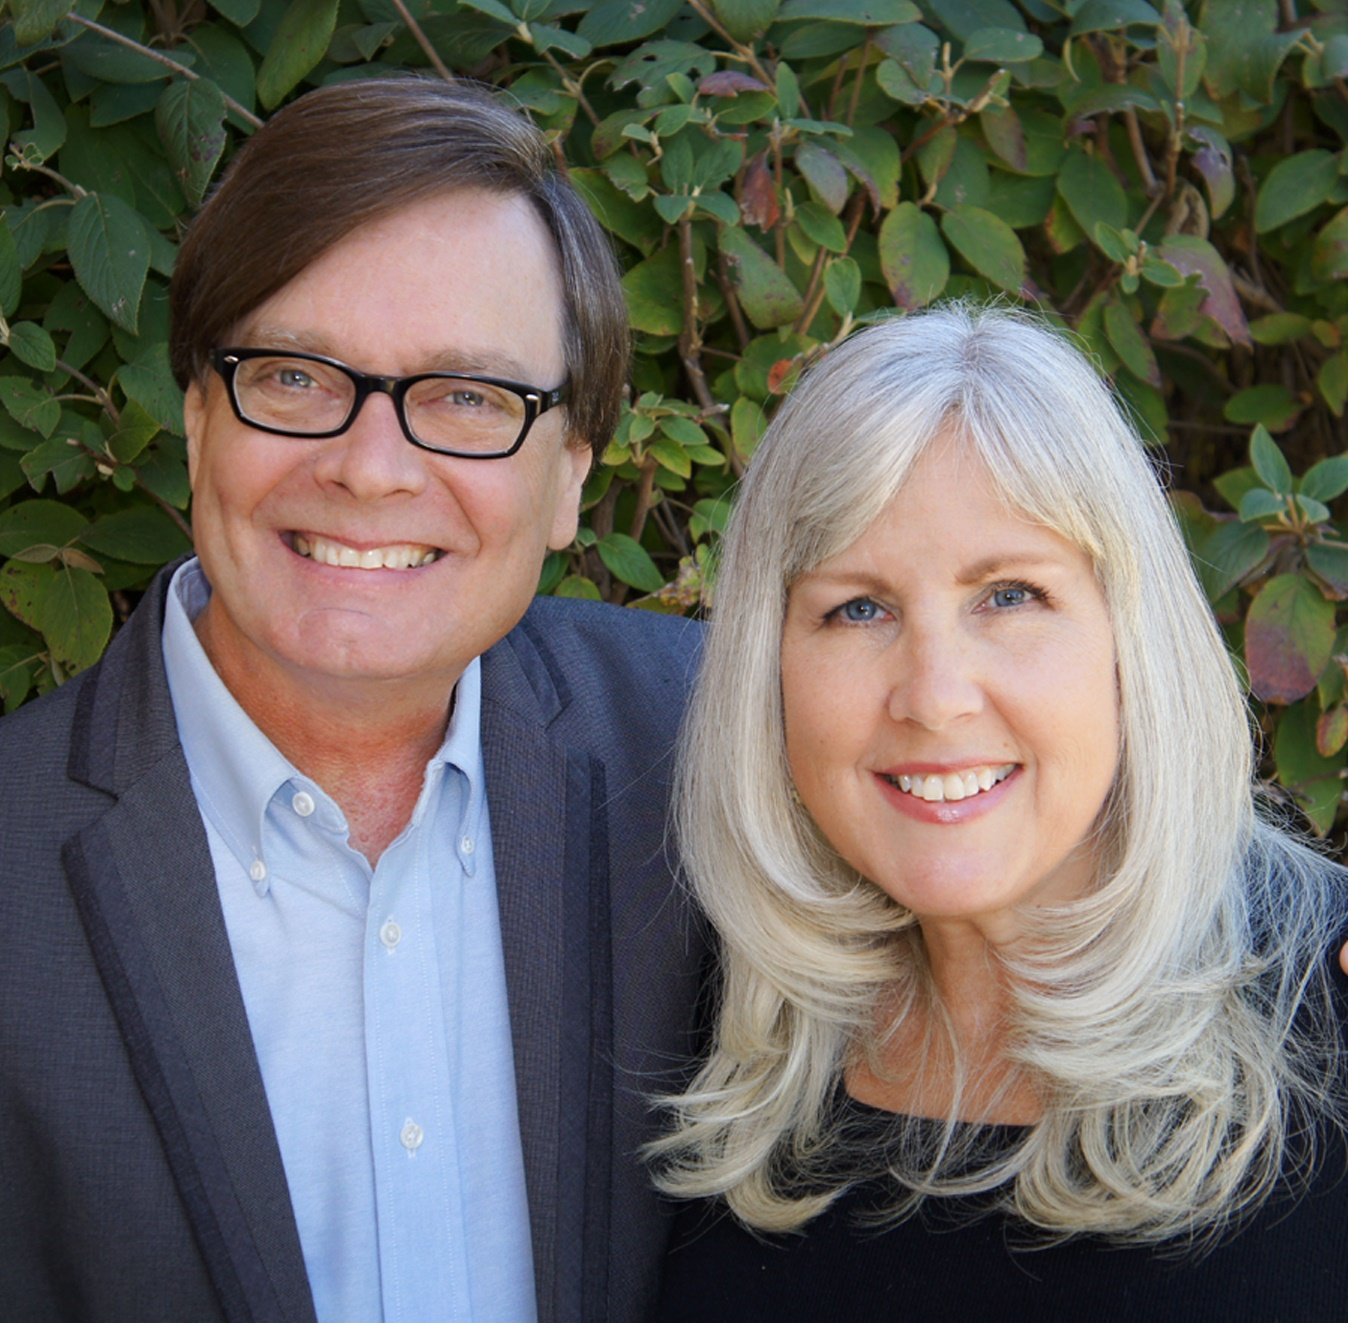 jimmy herter and real estate agent judy orr of homesmart scottsdale arizona